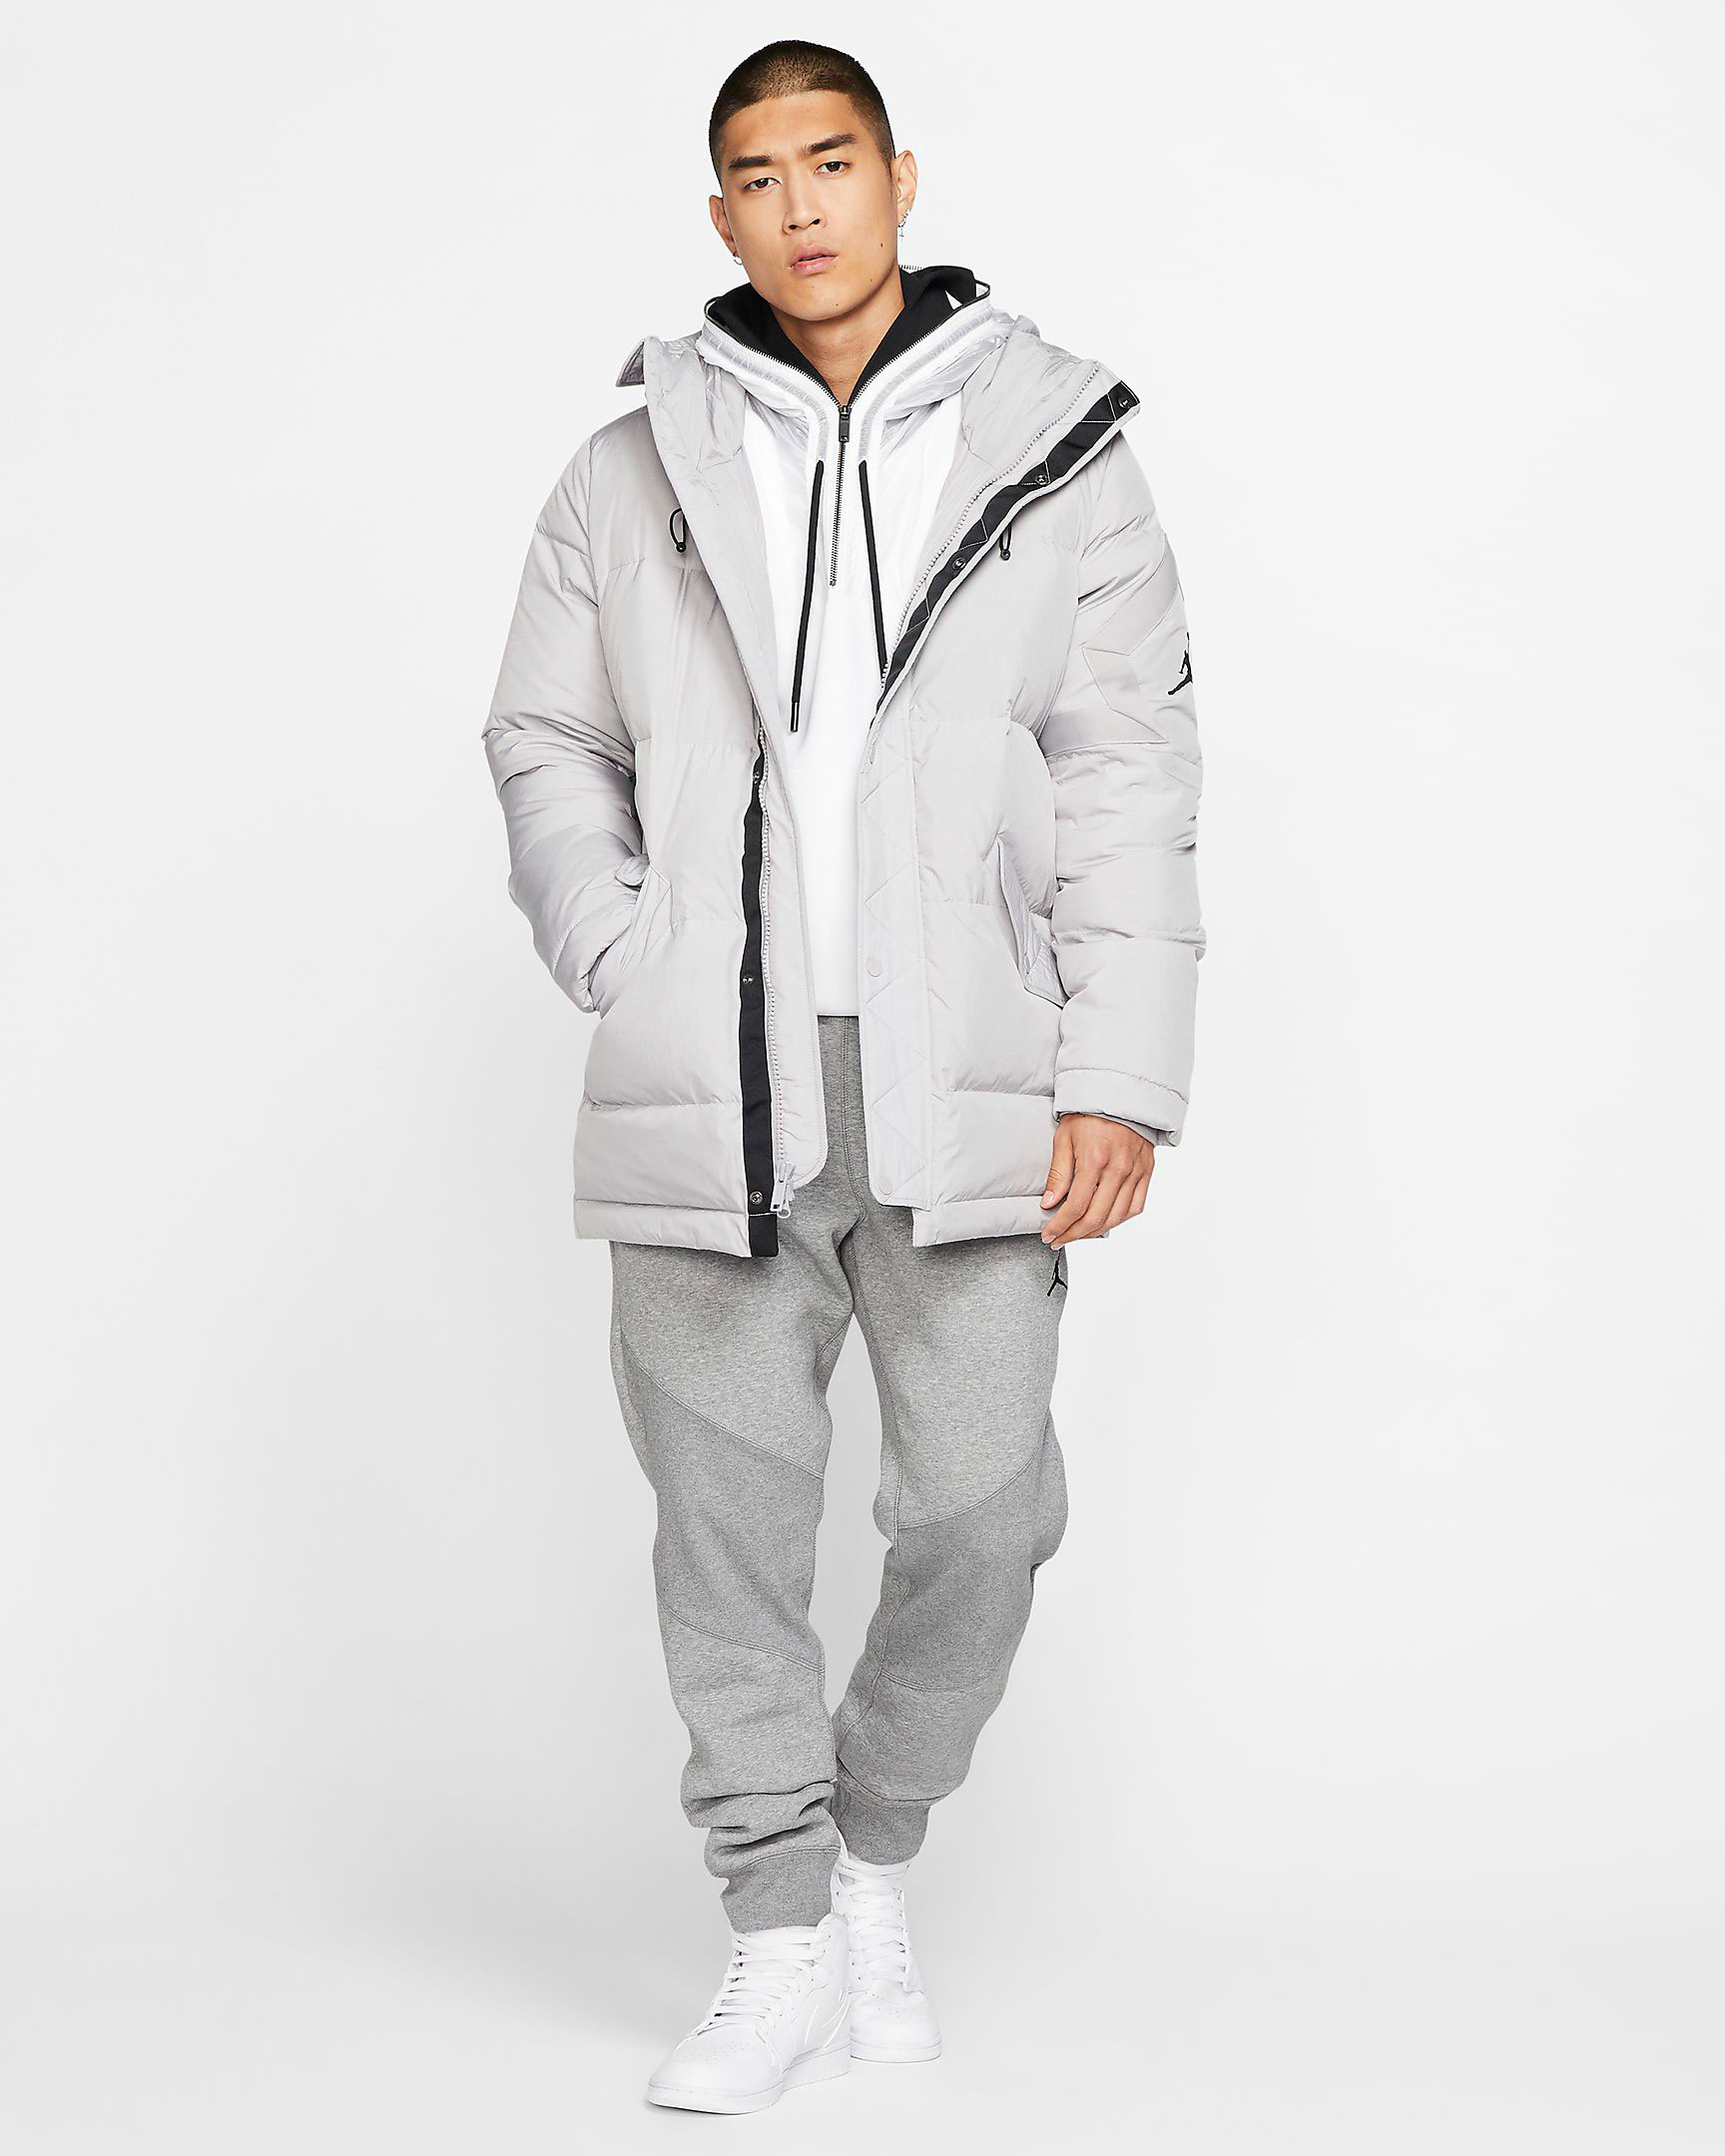 jordan-wings-down-parka-jacket-grey-6